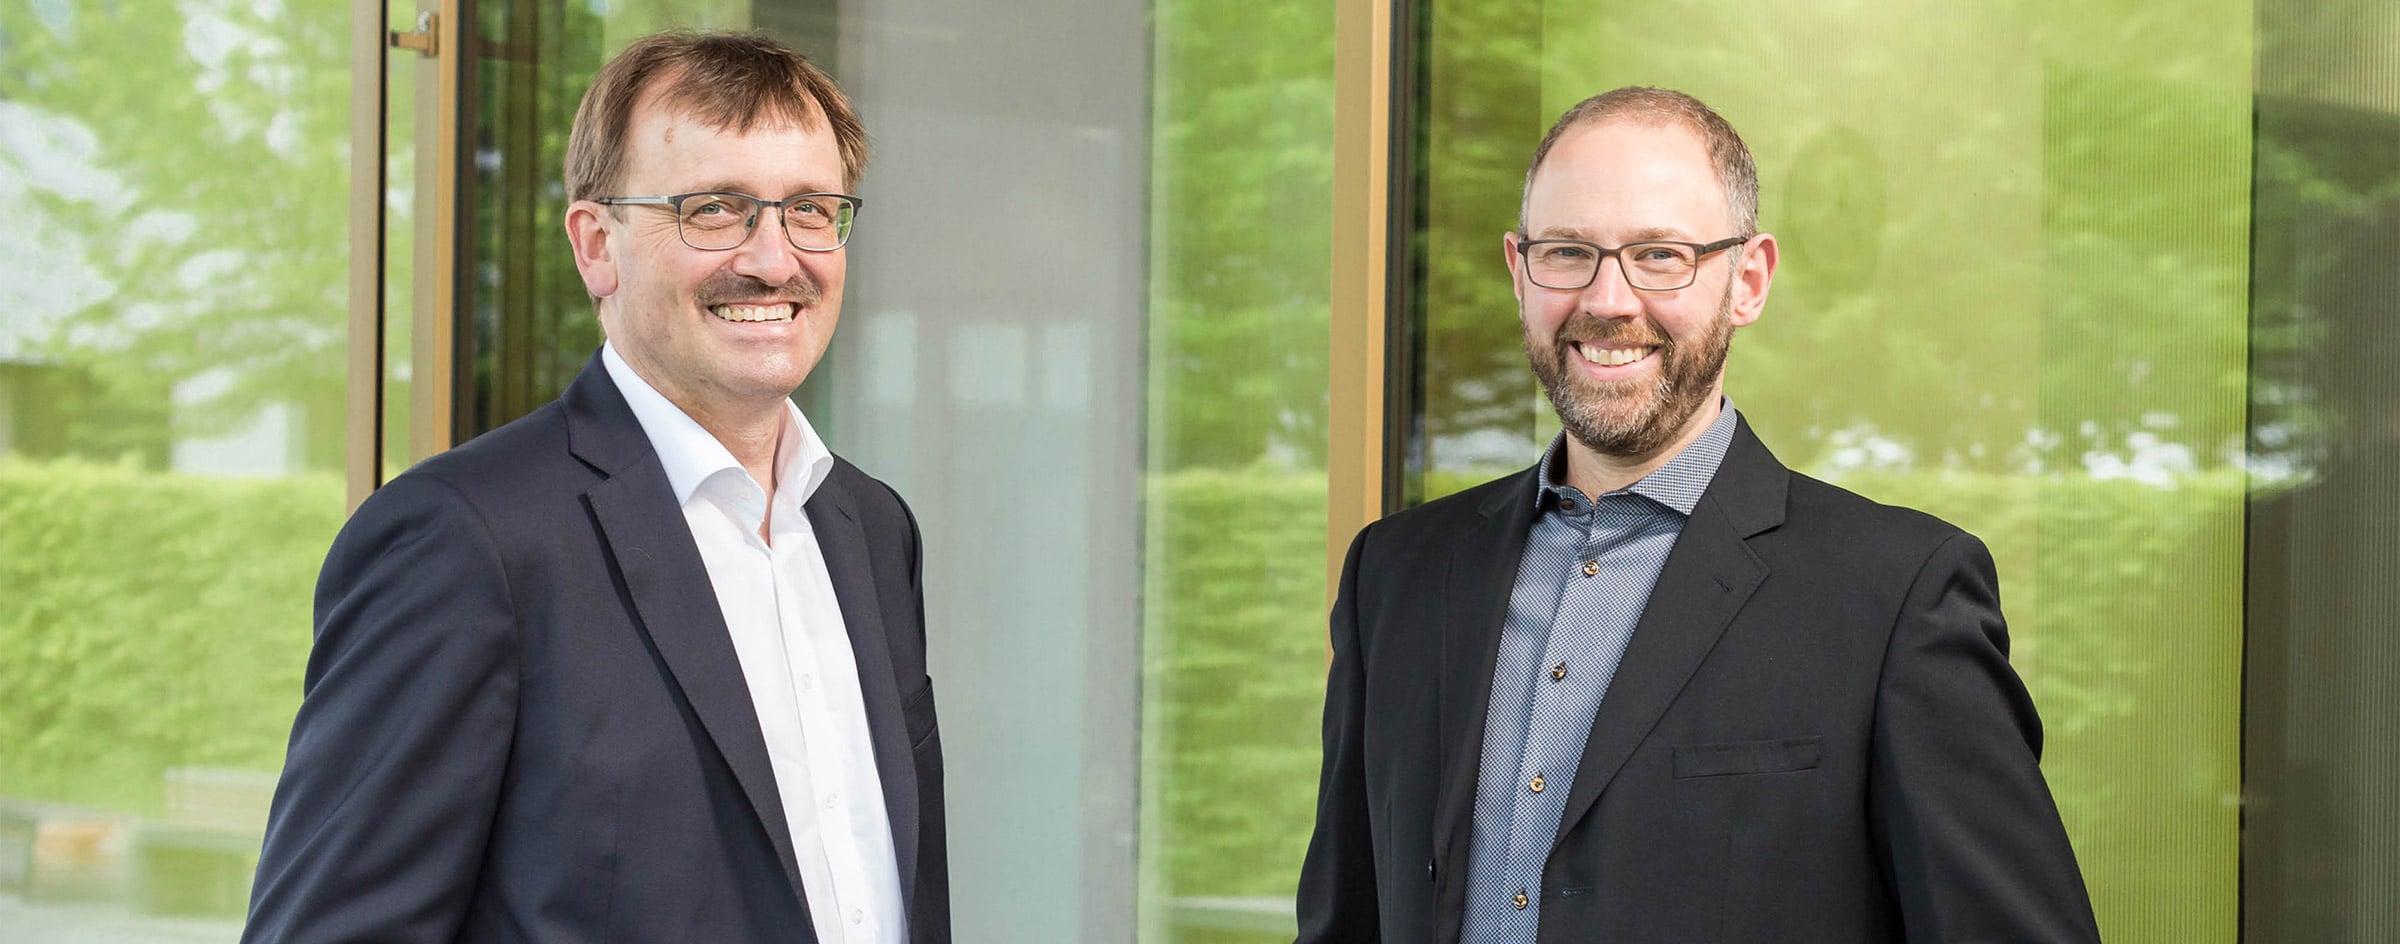 BBS Geschäftsführer Karl-Heinz Frings und Peter Doberass